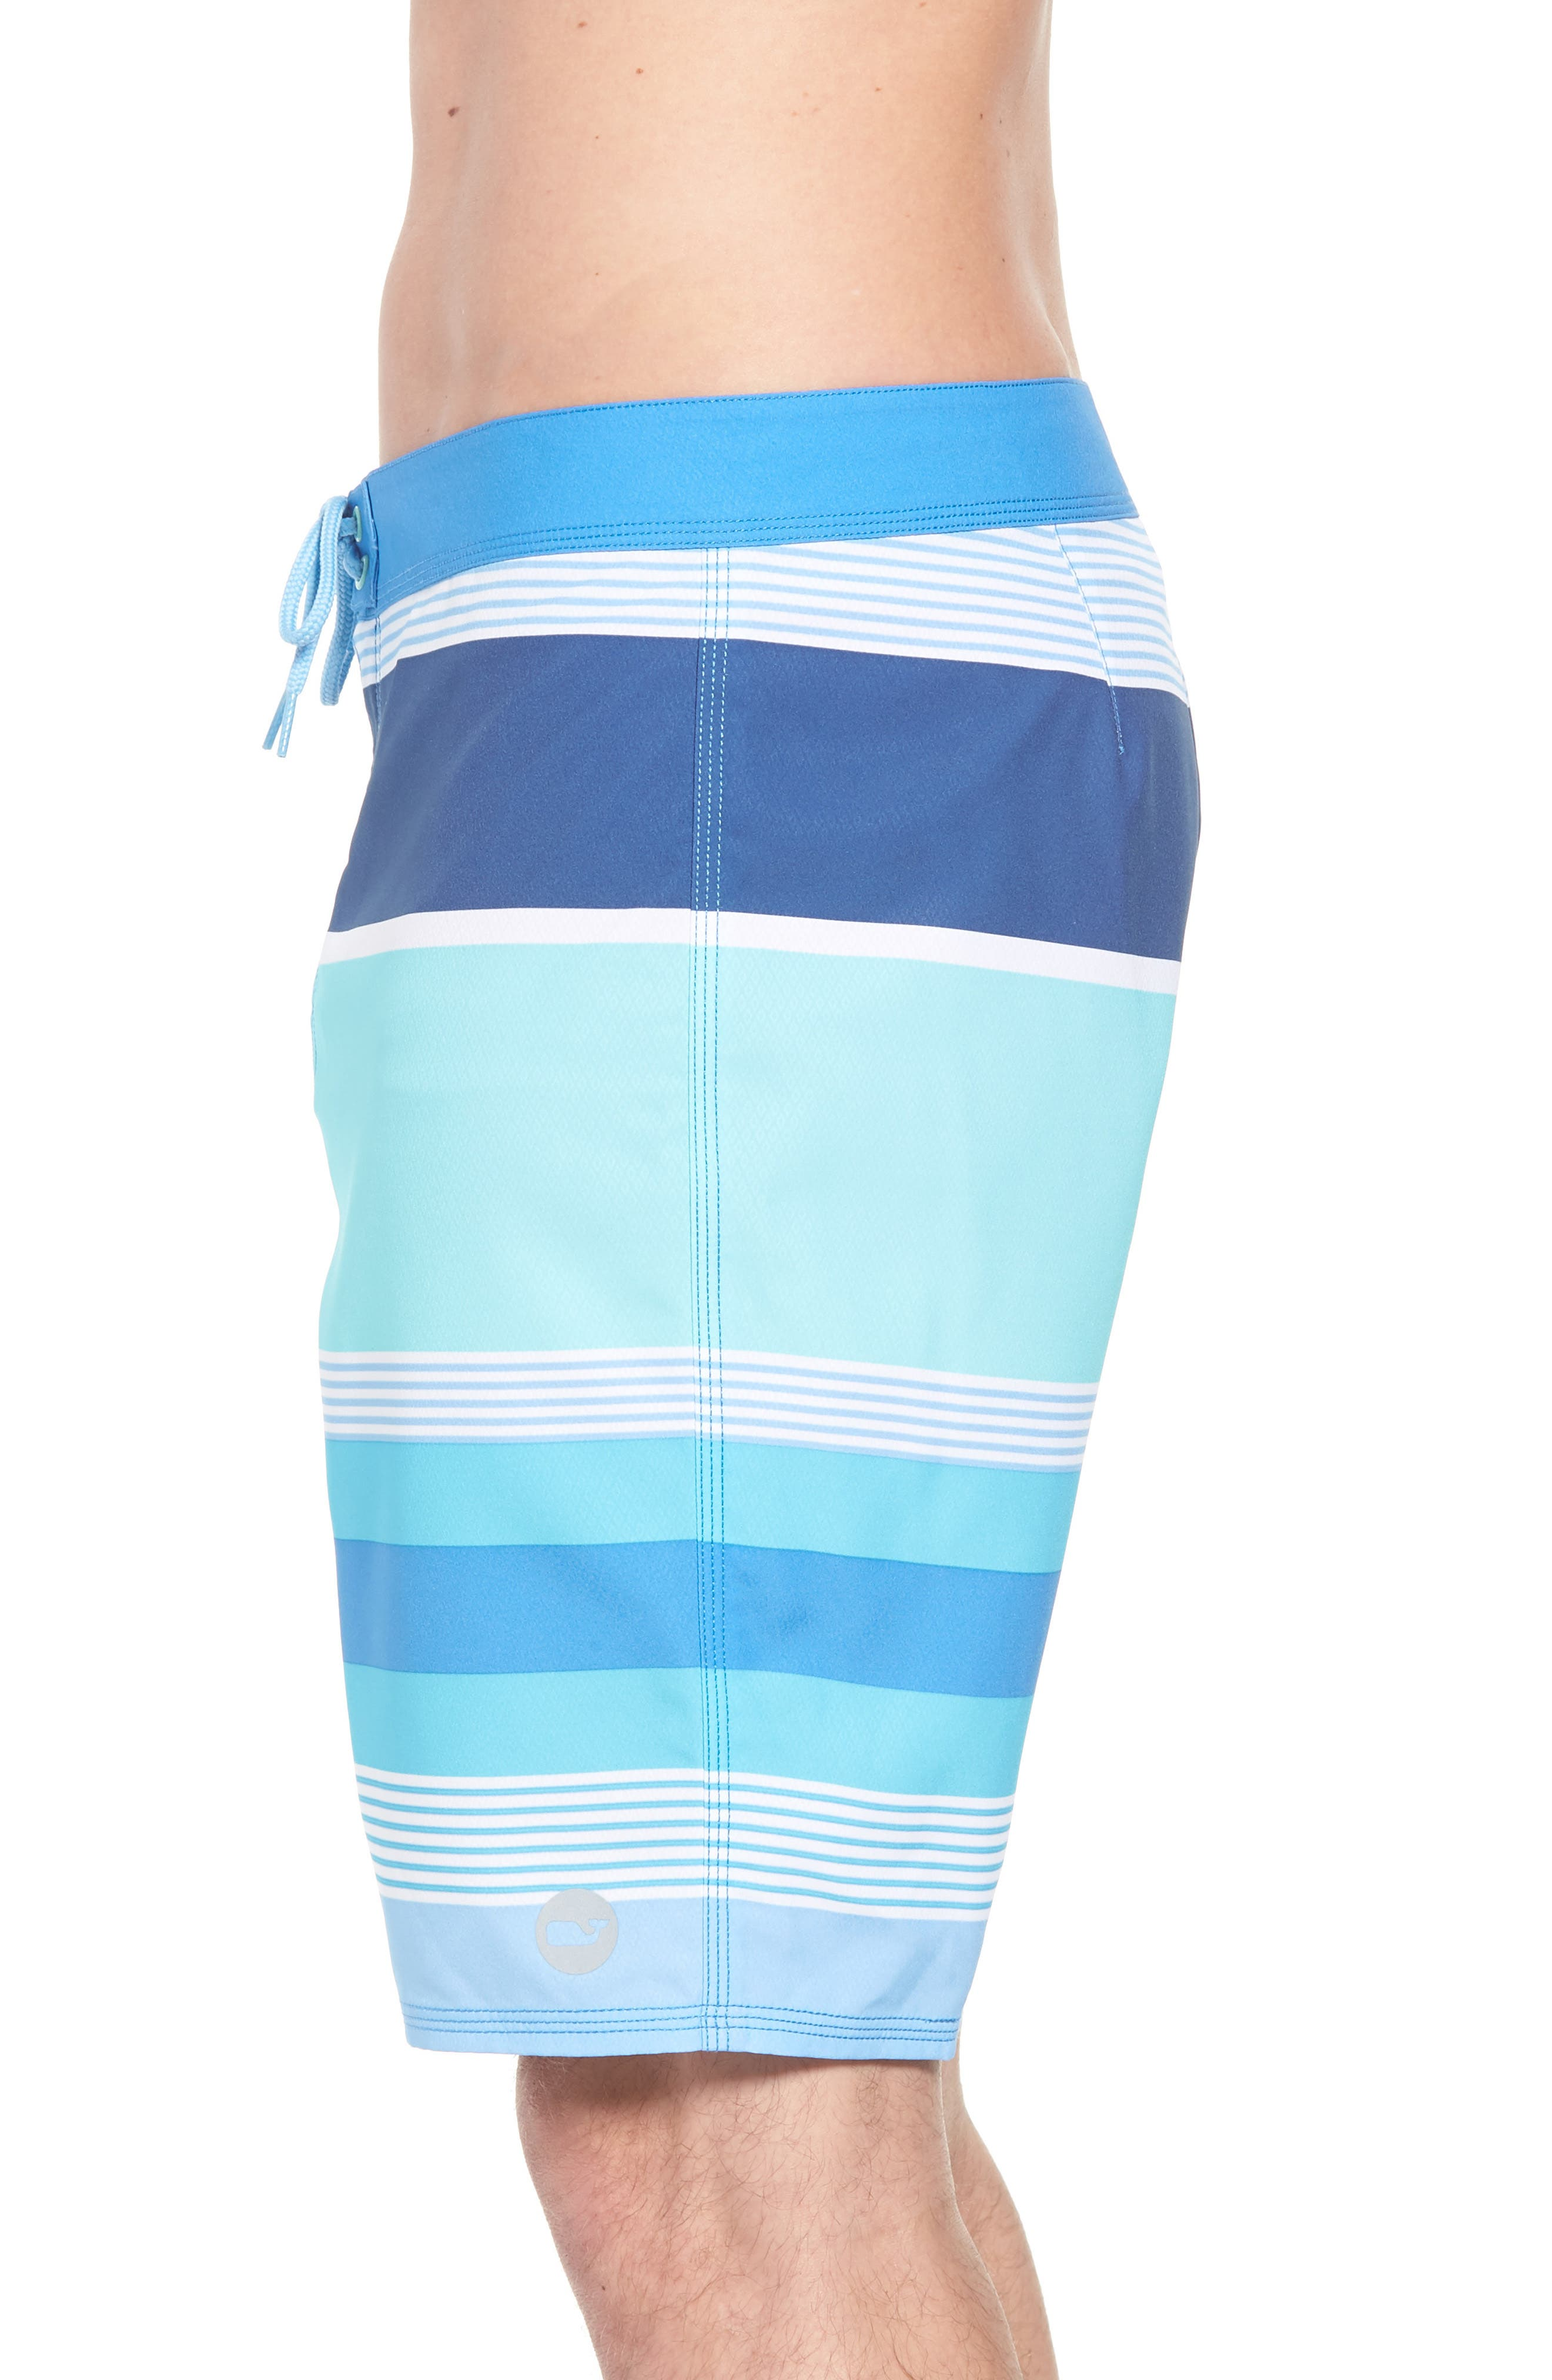 Peaks Island Board Shorts,                             Alternate thumbnail 4, color,                             Poolside